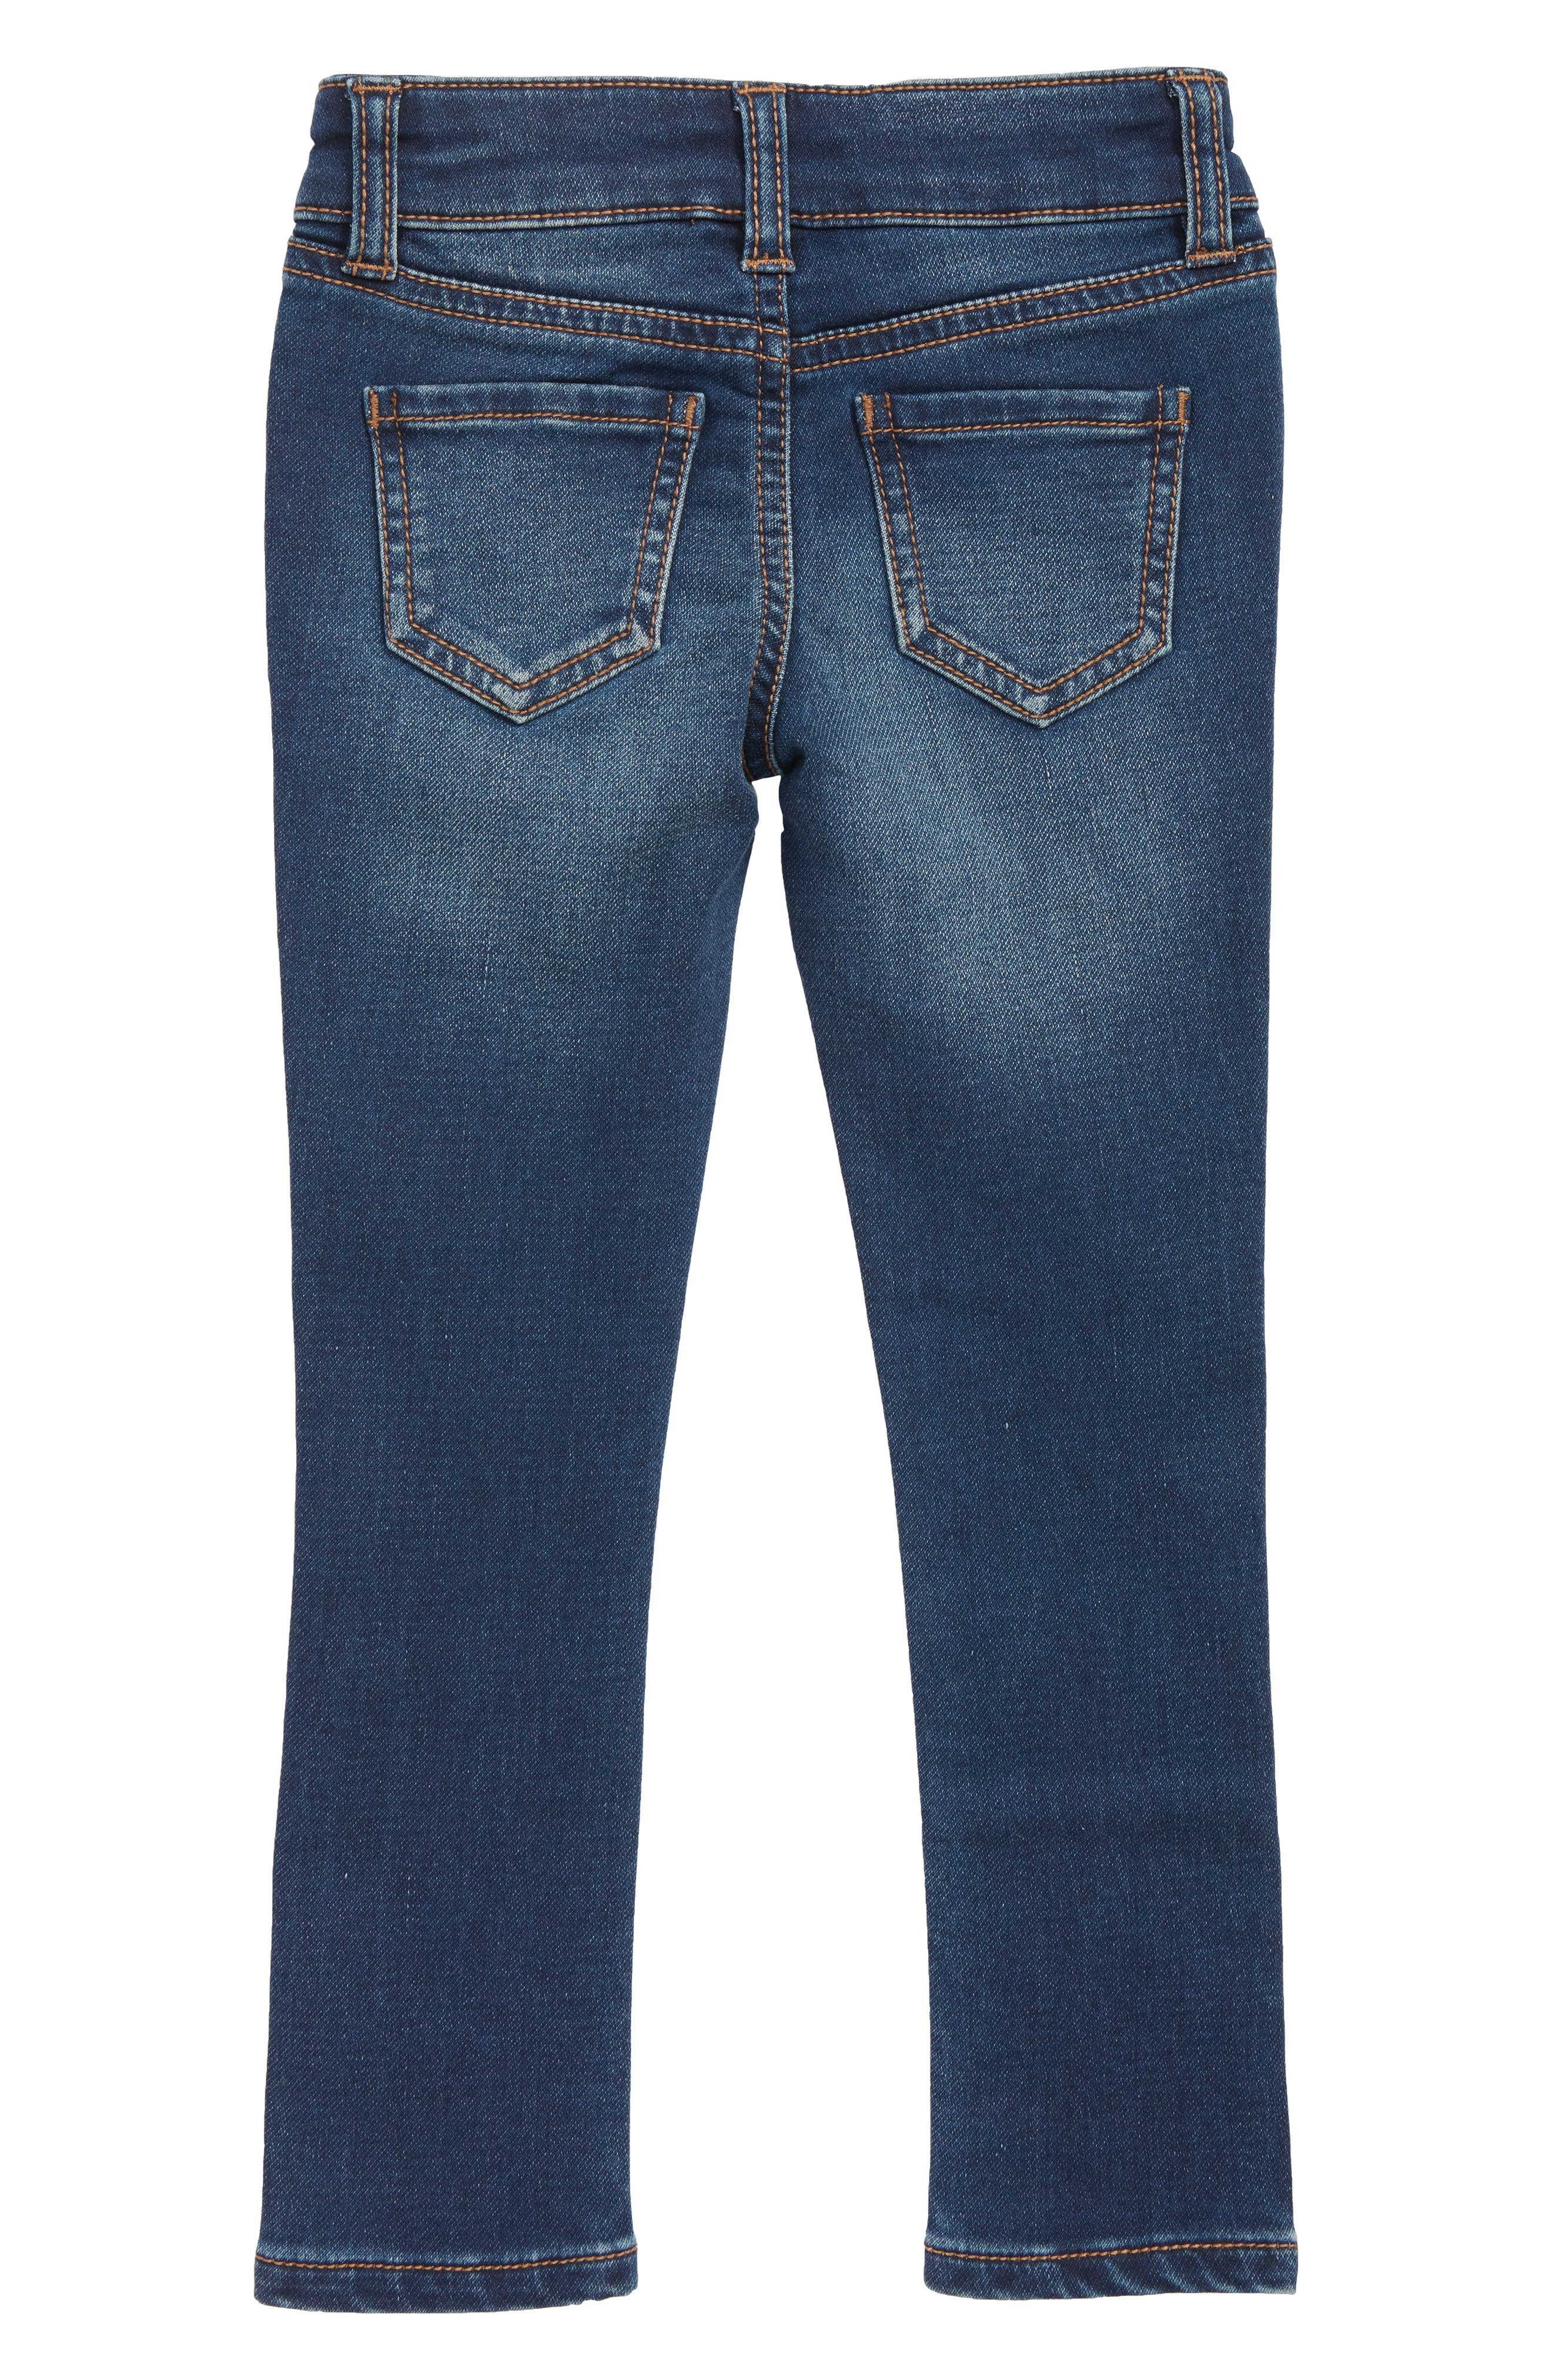 Taylor Jeans,                             Alternate thumbnail 2, color,                             RINSE